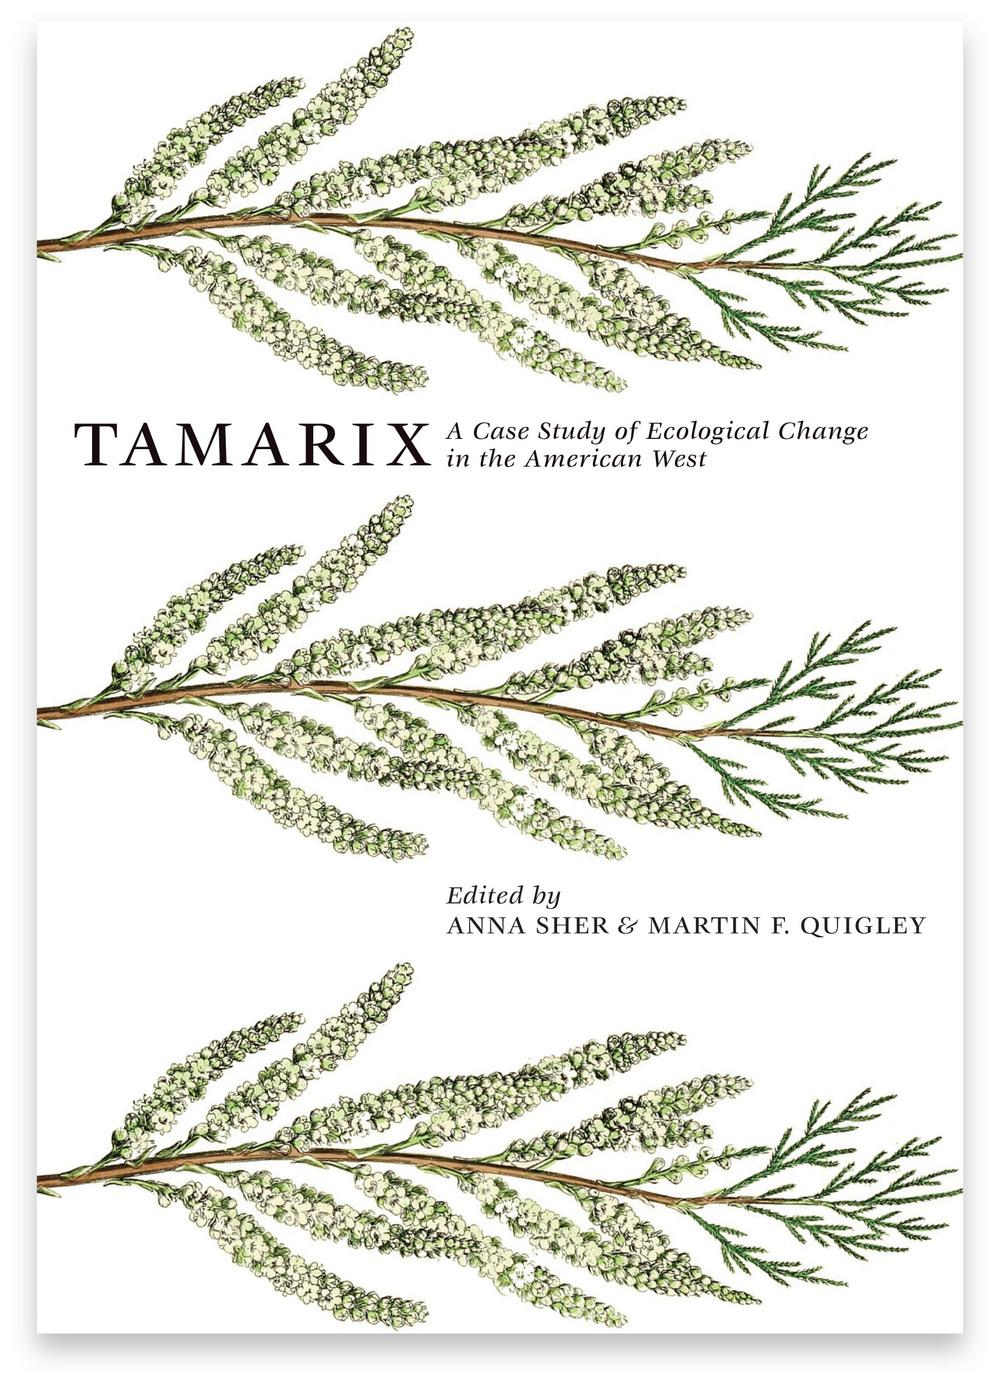 TamarixWebsite1.jpg